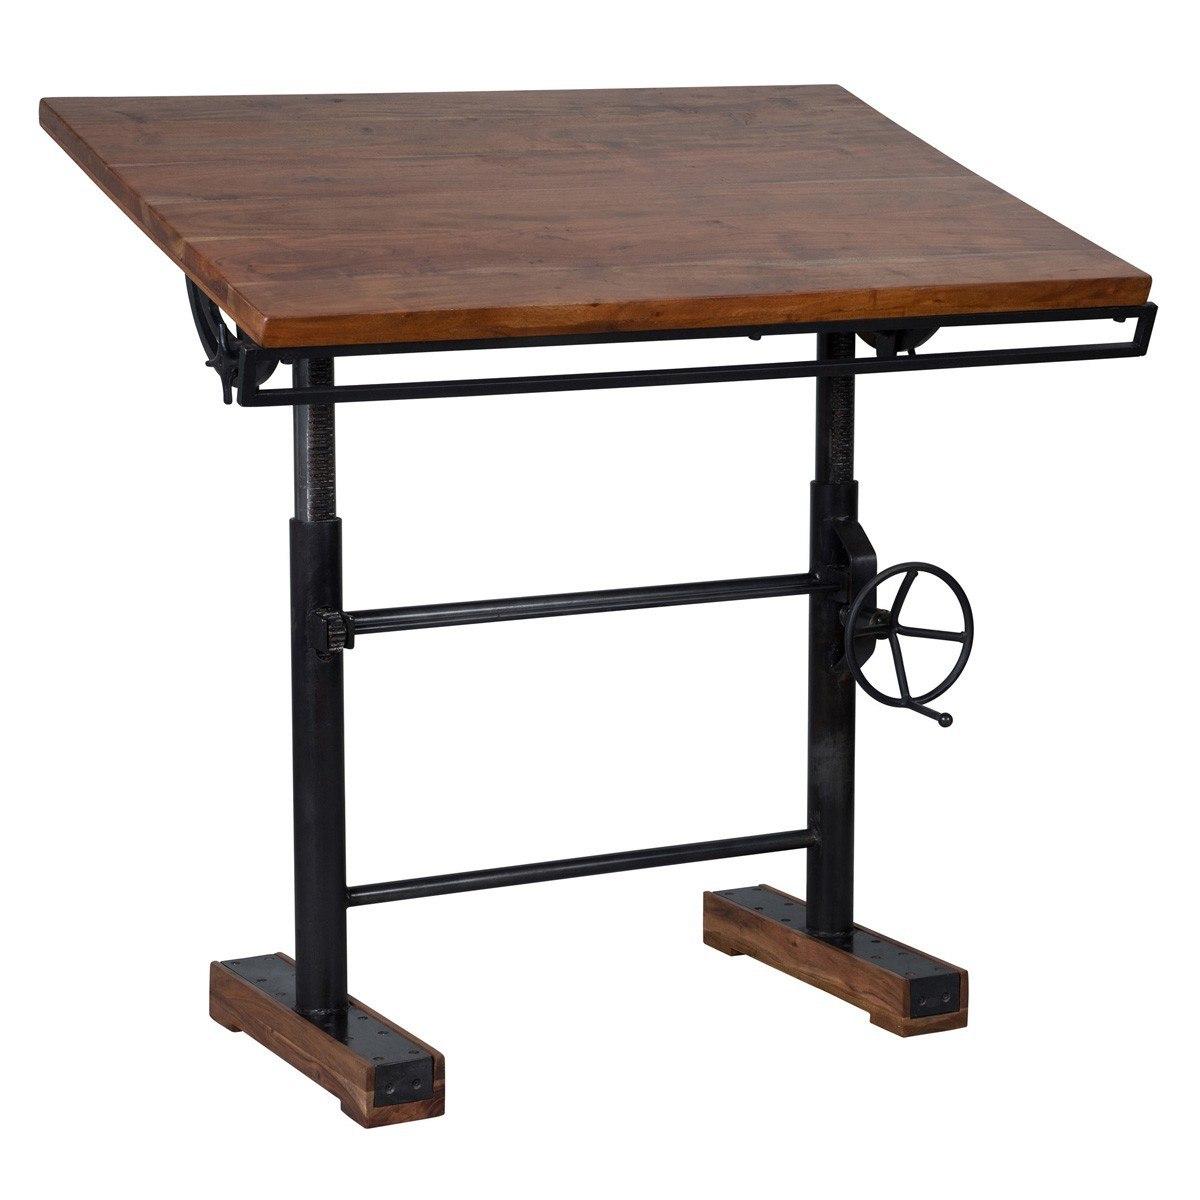 Steampunk industrial crank adjustable standing desk NVCKTJA